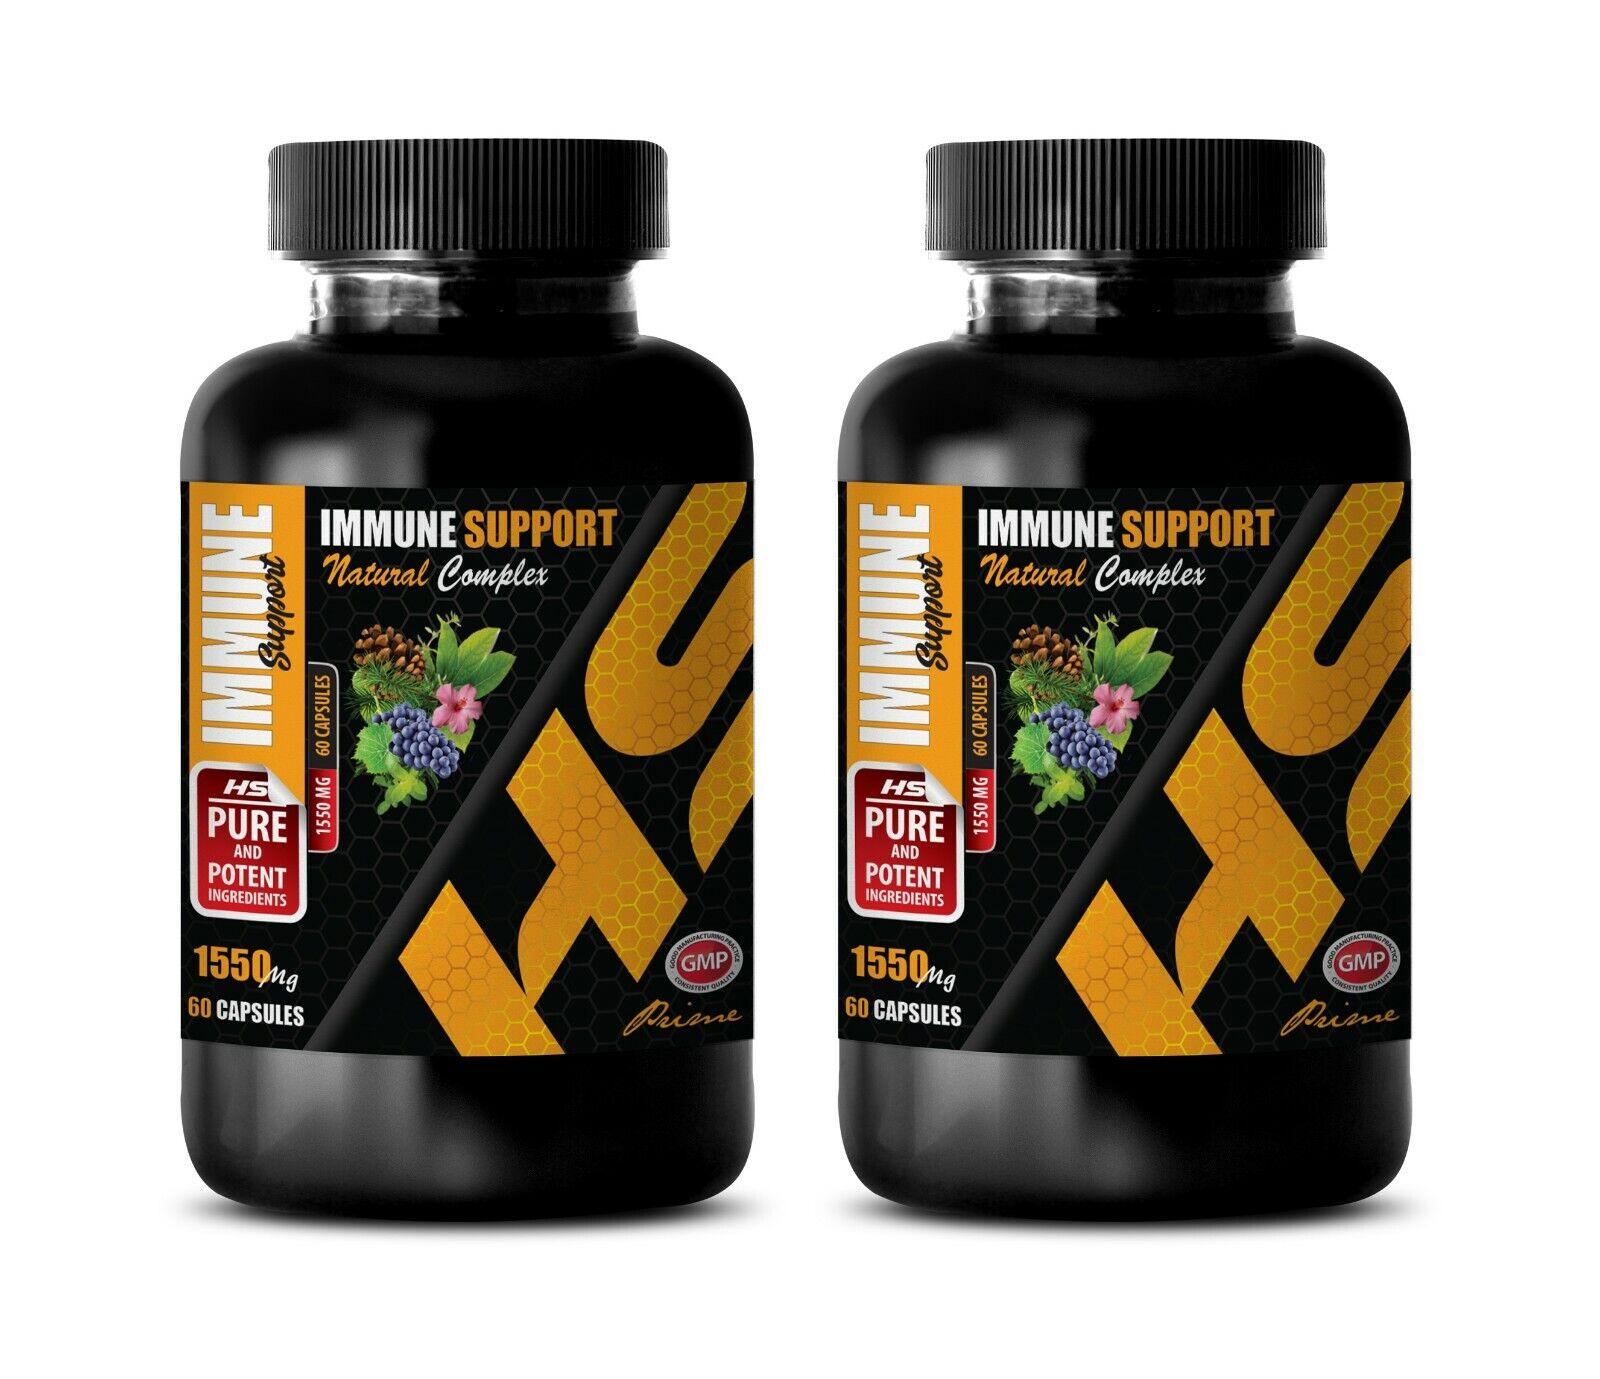 immune support for health - IMMUNE SUPPORT - blood pressure herbs 2 BOTTLE 1